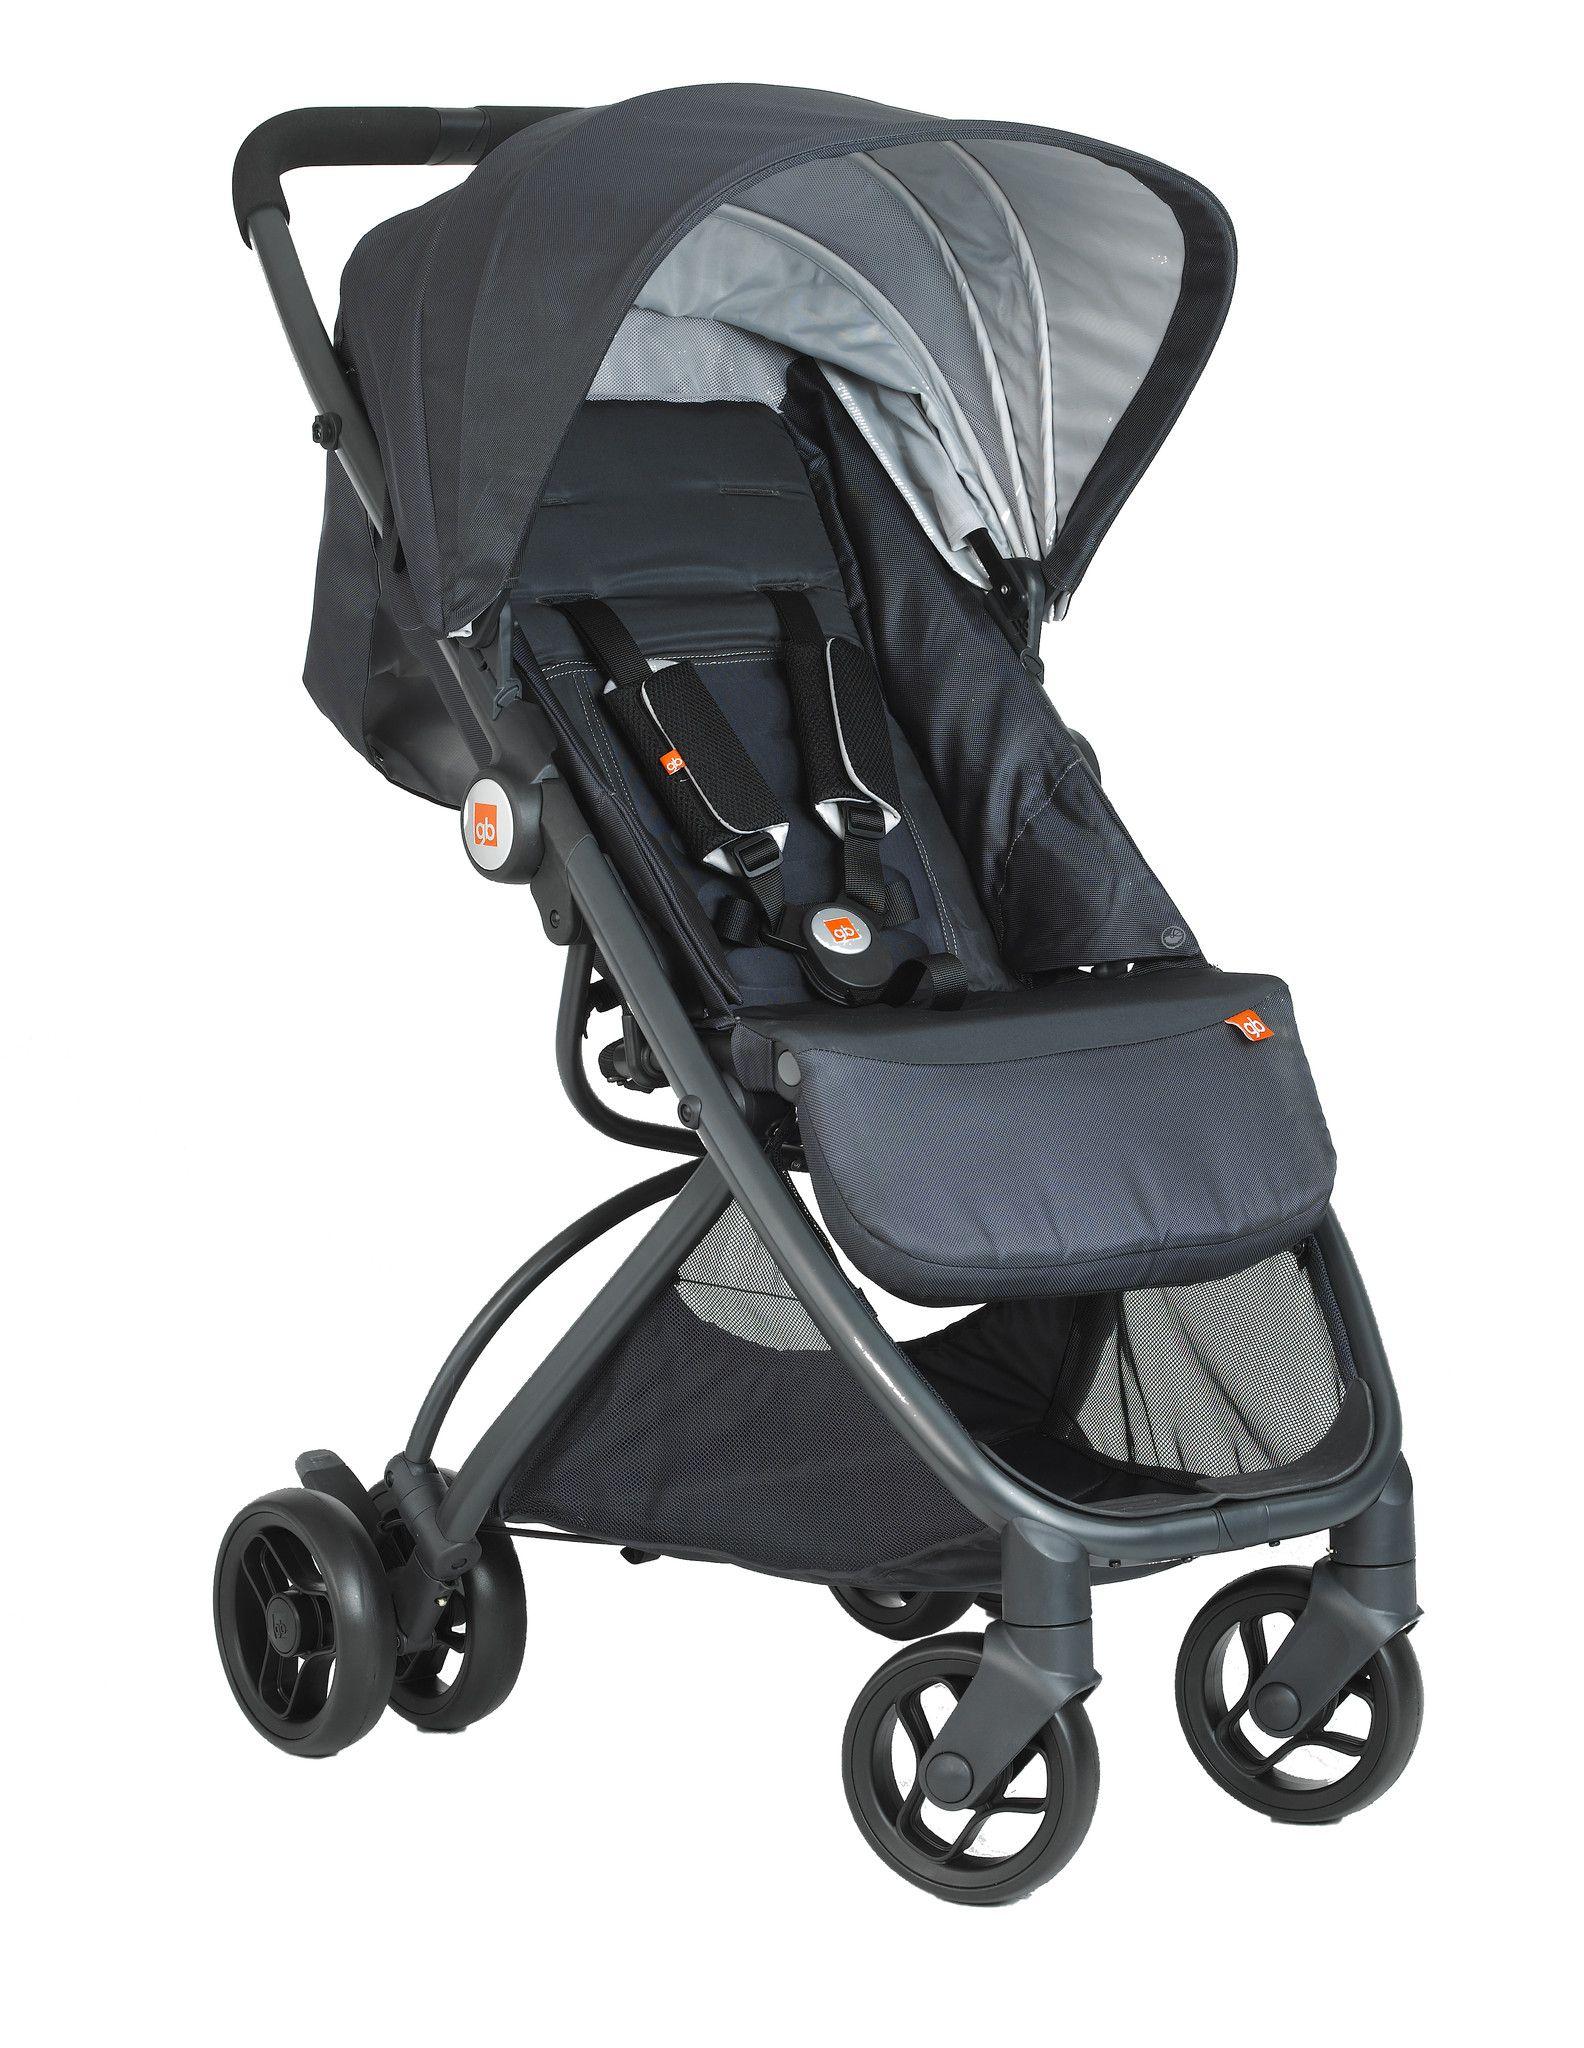 GB Ellum Stroller Sterling Stroller, Baby strollers, Ellum